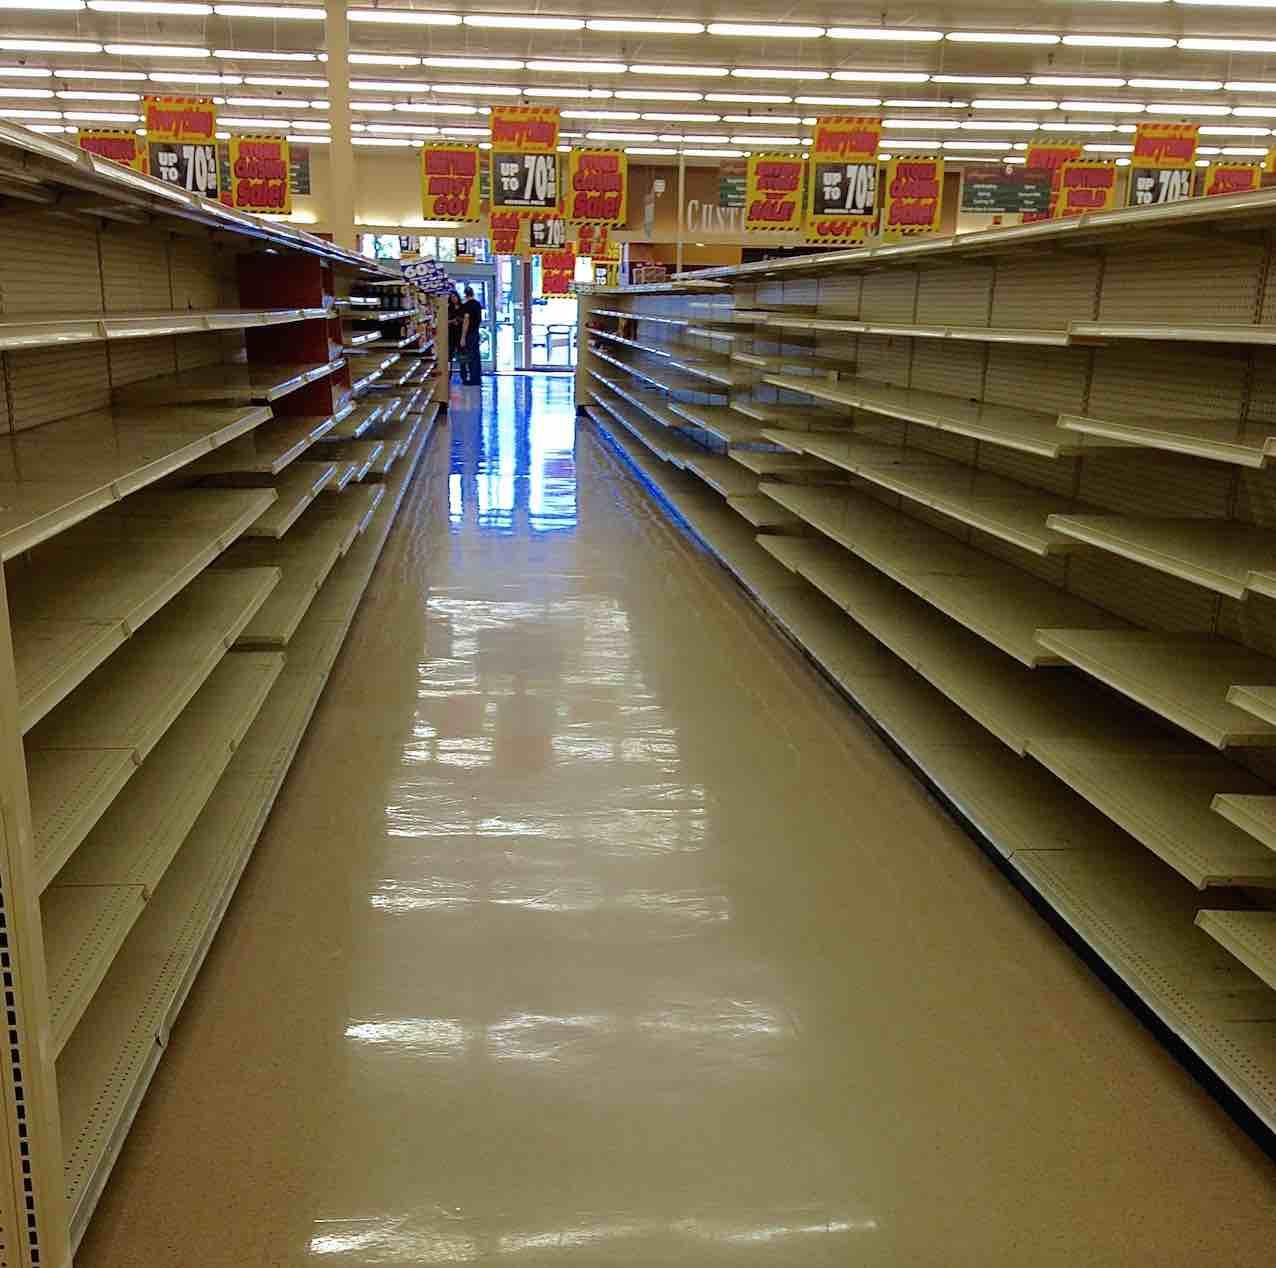 food empty shelves aisle dude market facts neighborhood goods quality